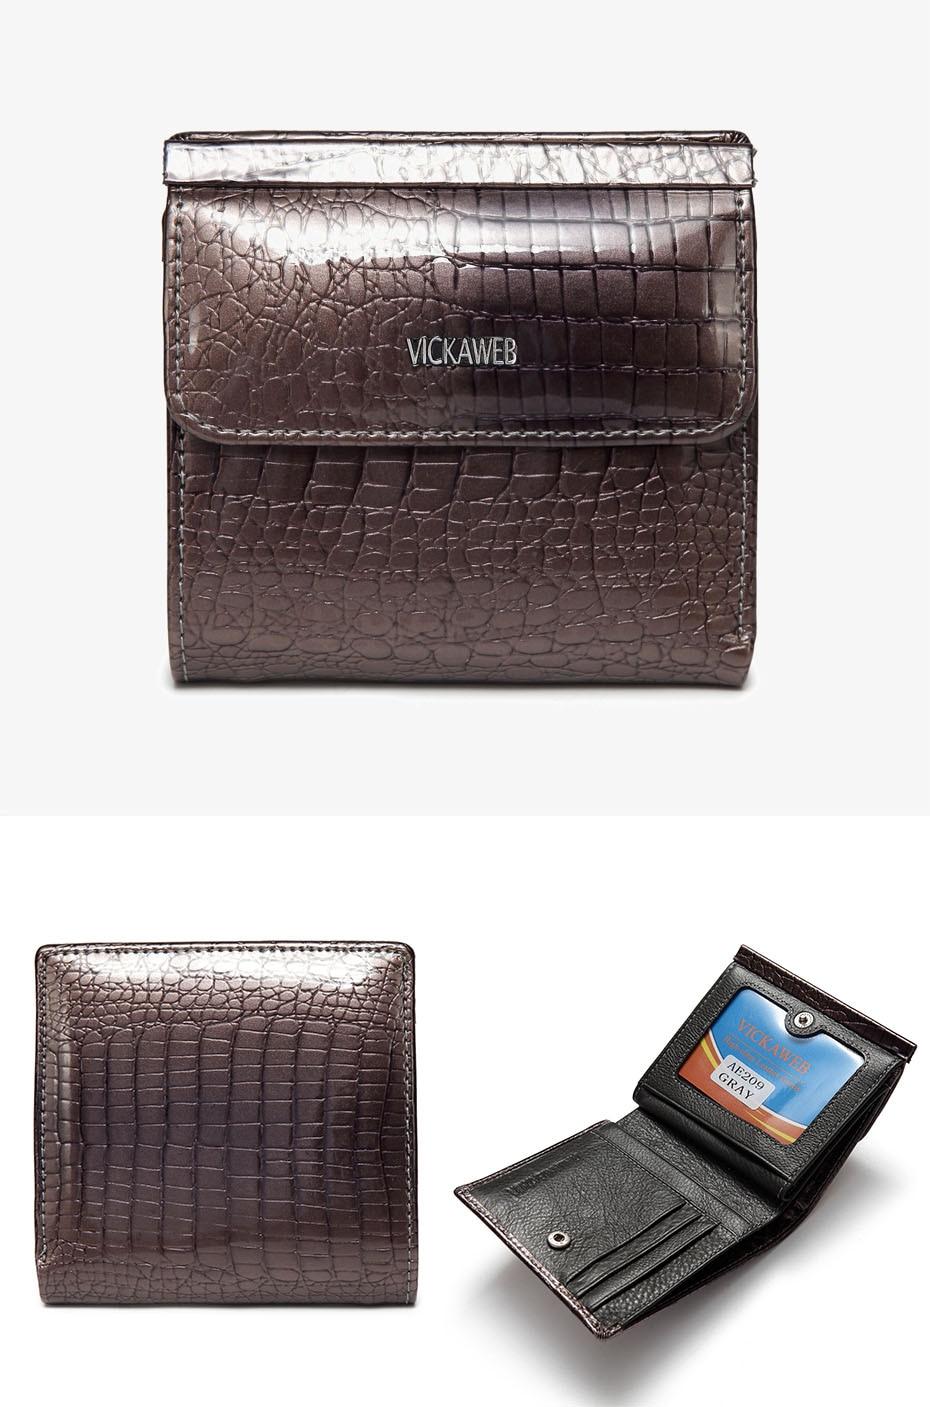 VICKAWEB Mini Wallet Women Genuine Leather Wallets Fashion Alligator Hasp Short Wallet Female Small Woman Wallets And Purses-AE209-021